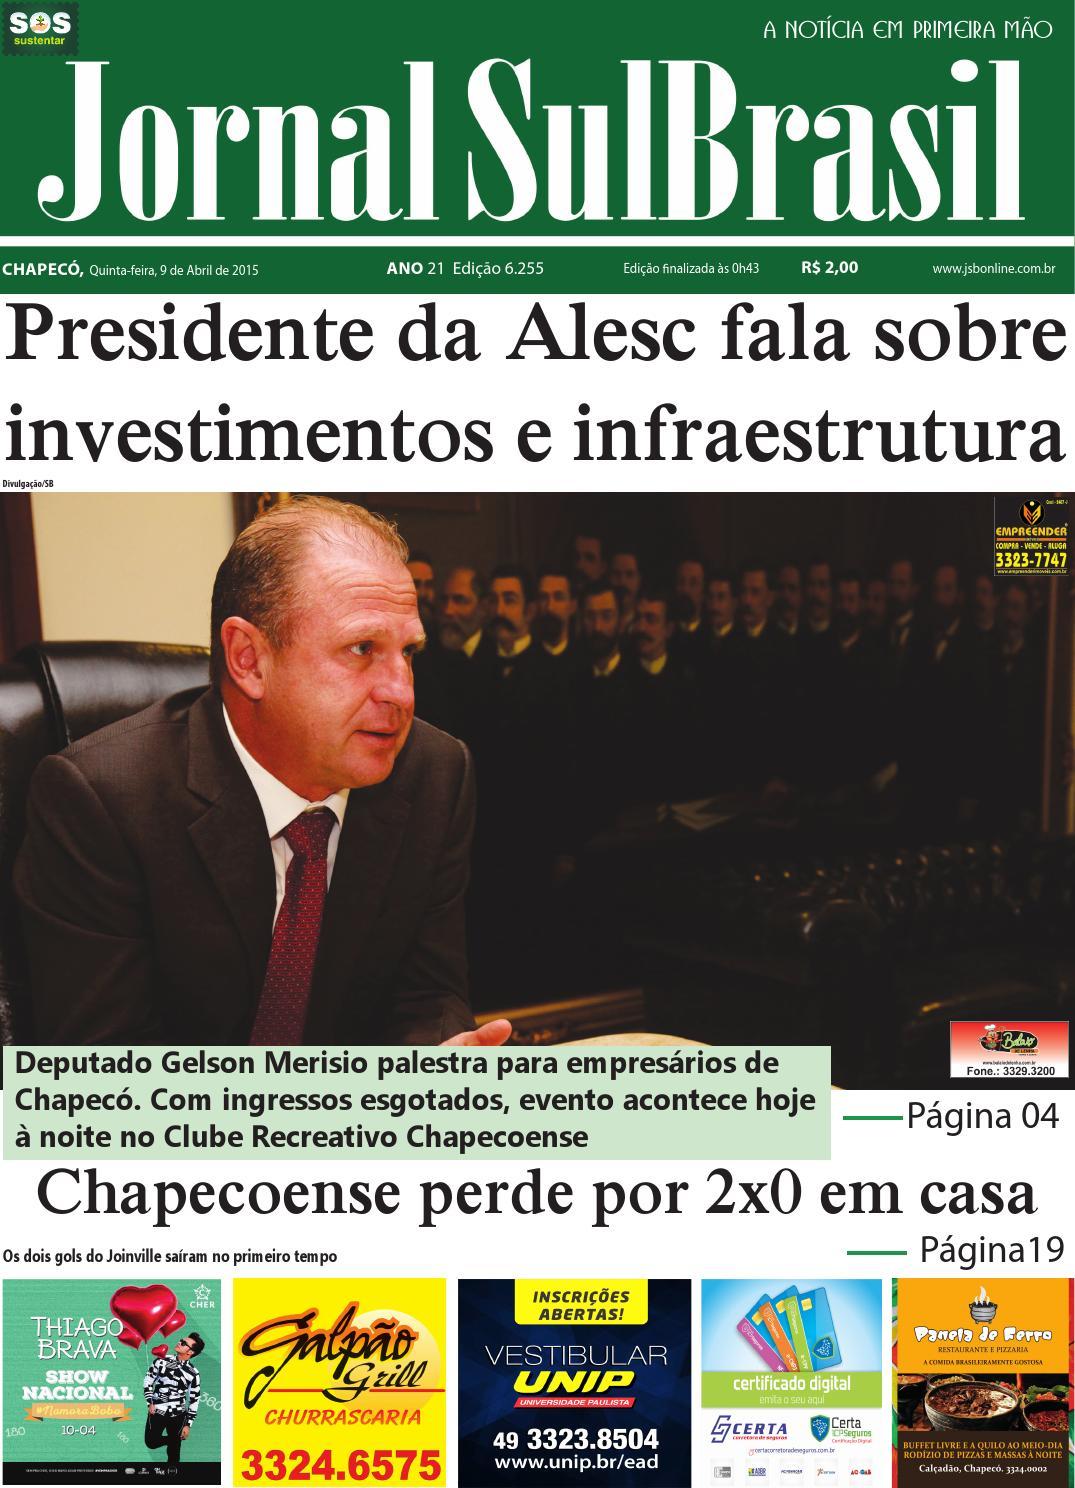 09 quinta sul brasil by Jornal Sul Brasil Chapecó - issuu 23babf36e4